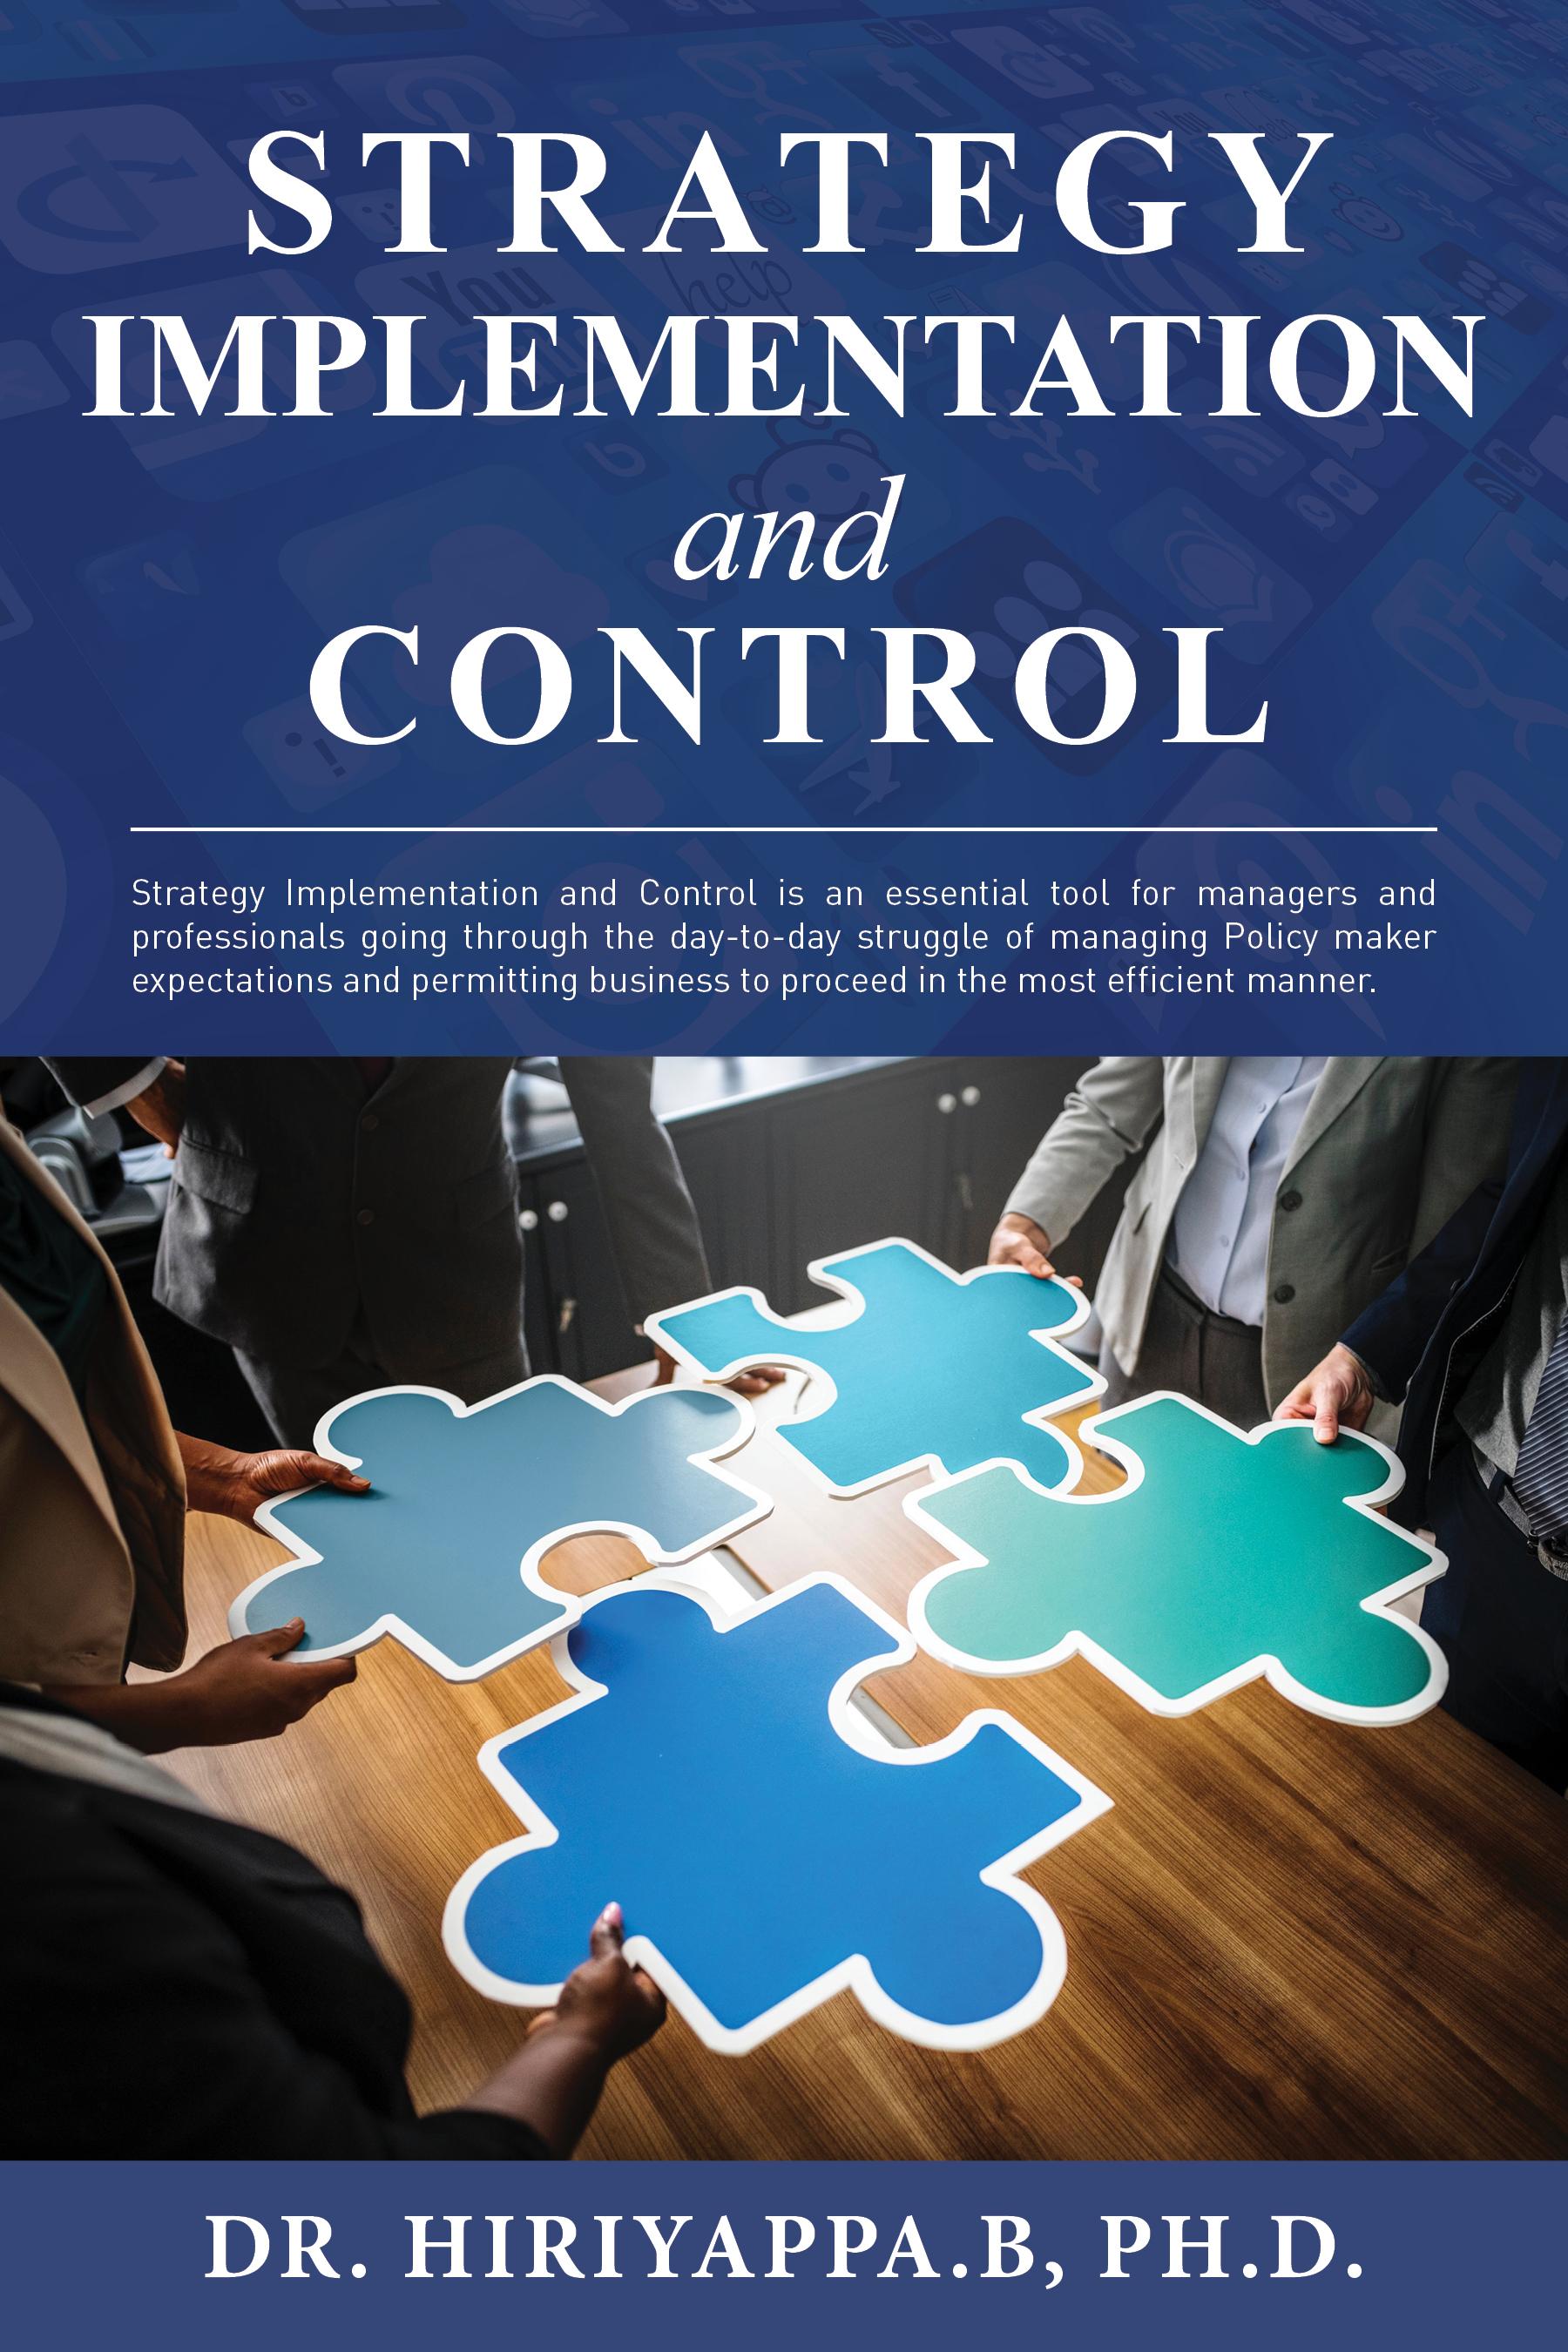 Strategy Implementation and Control, an Ebook by Hiriyappa B